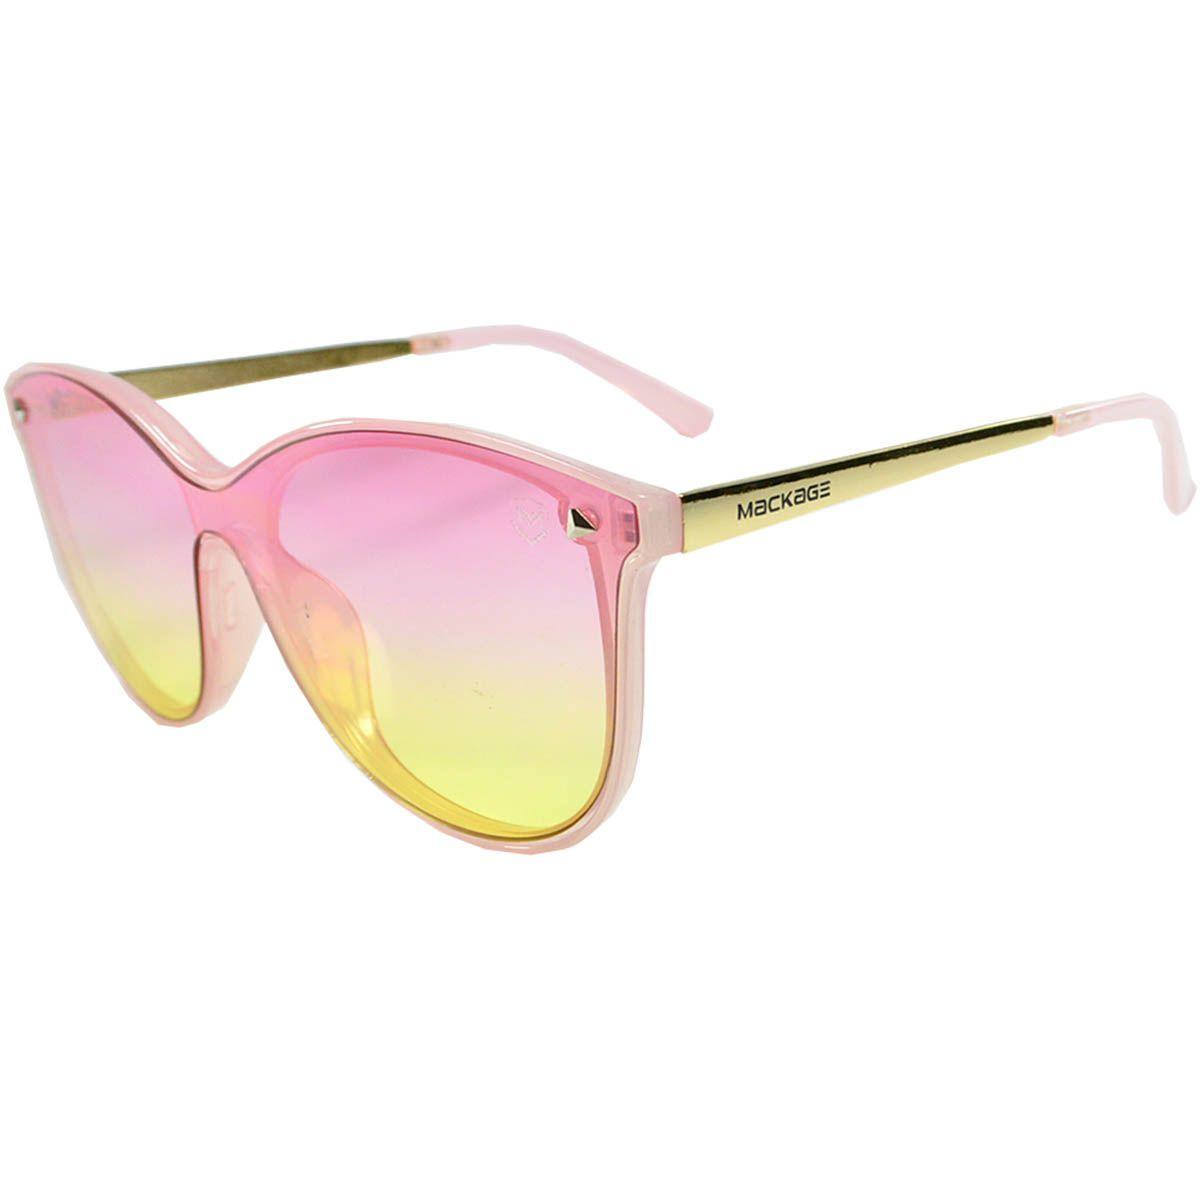 66eb77b80ec93 Óculos de Sol Feminino Mackage MK92011PT Preto Tarta